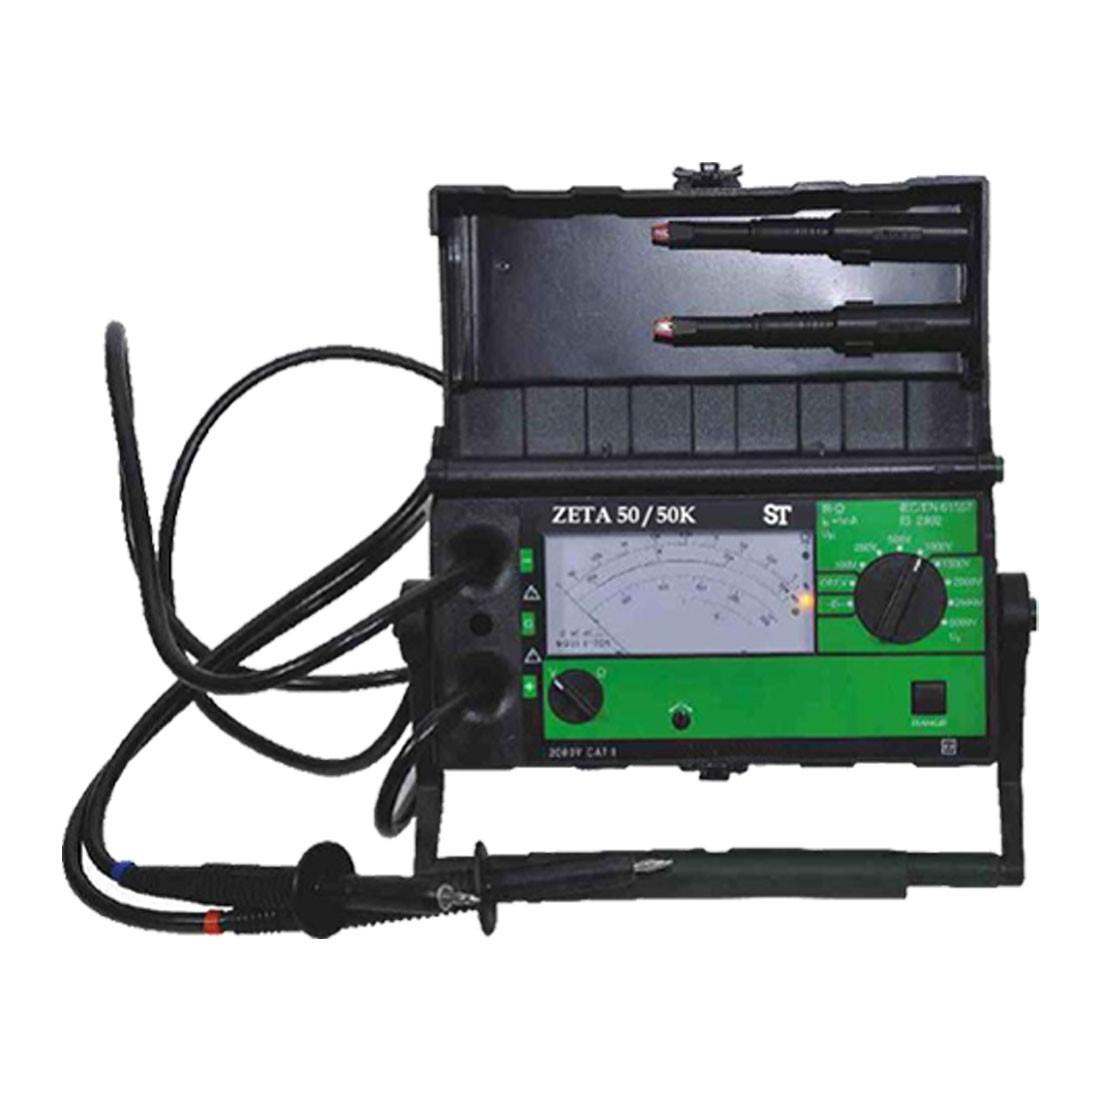 Zeta 50 Benchtop Analog Insulation Resistance Tester